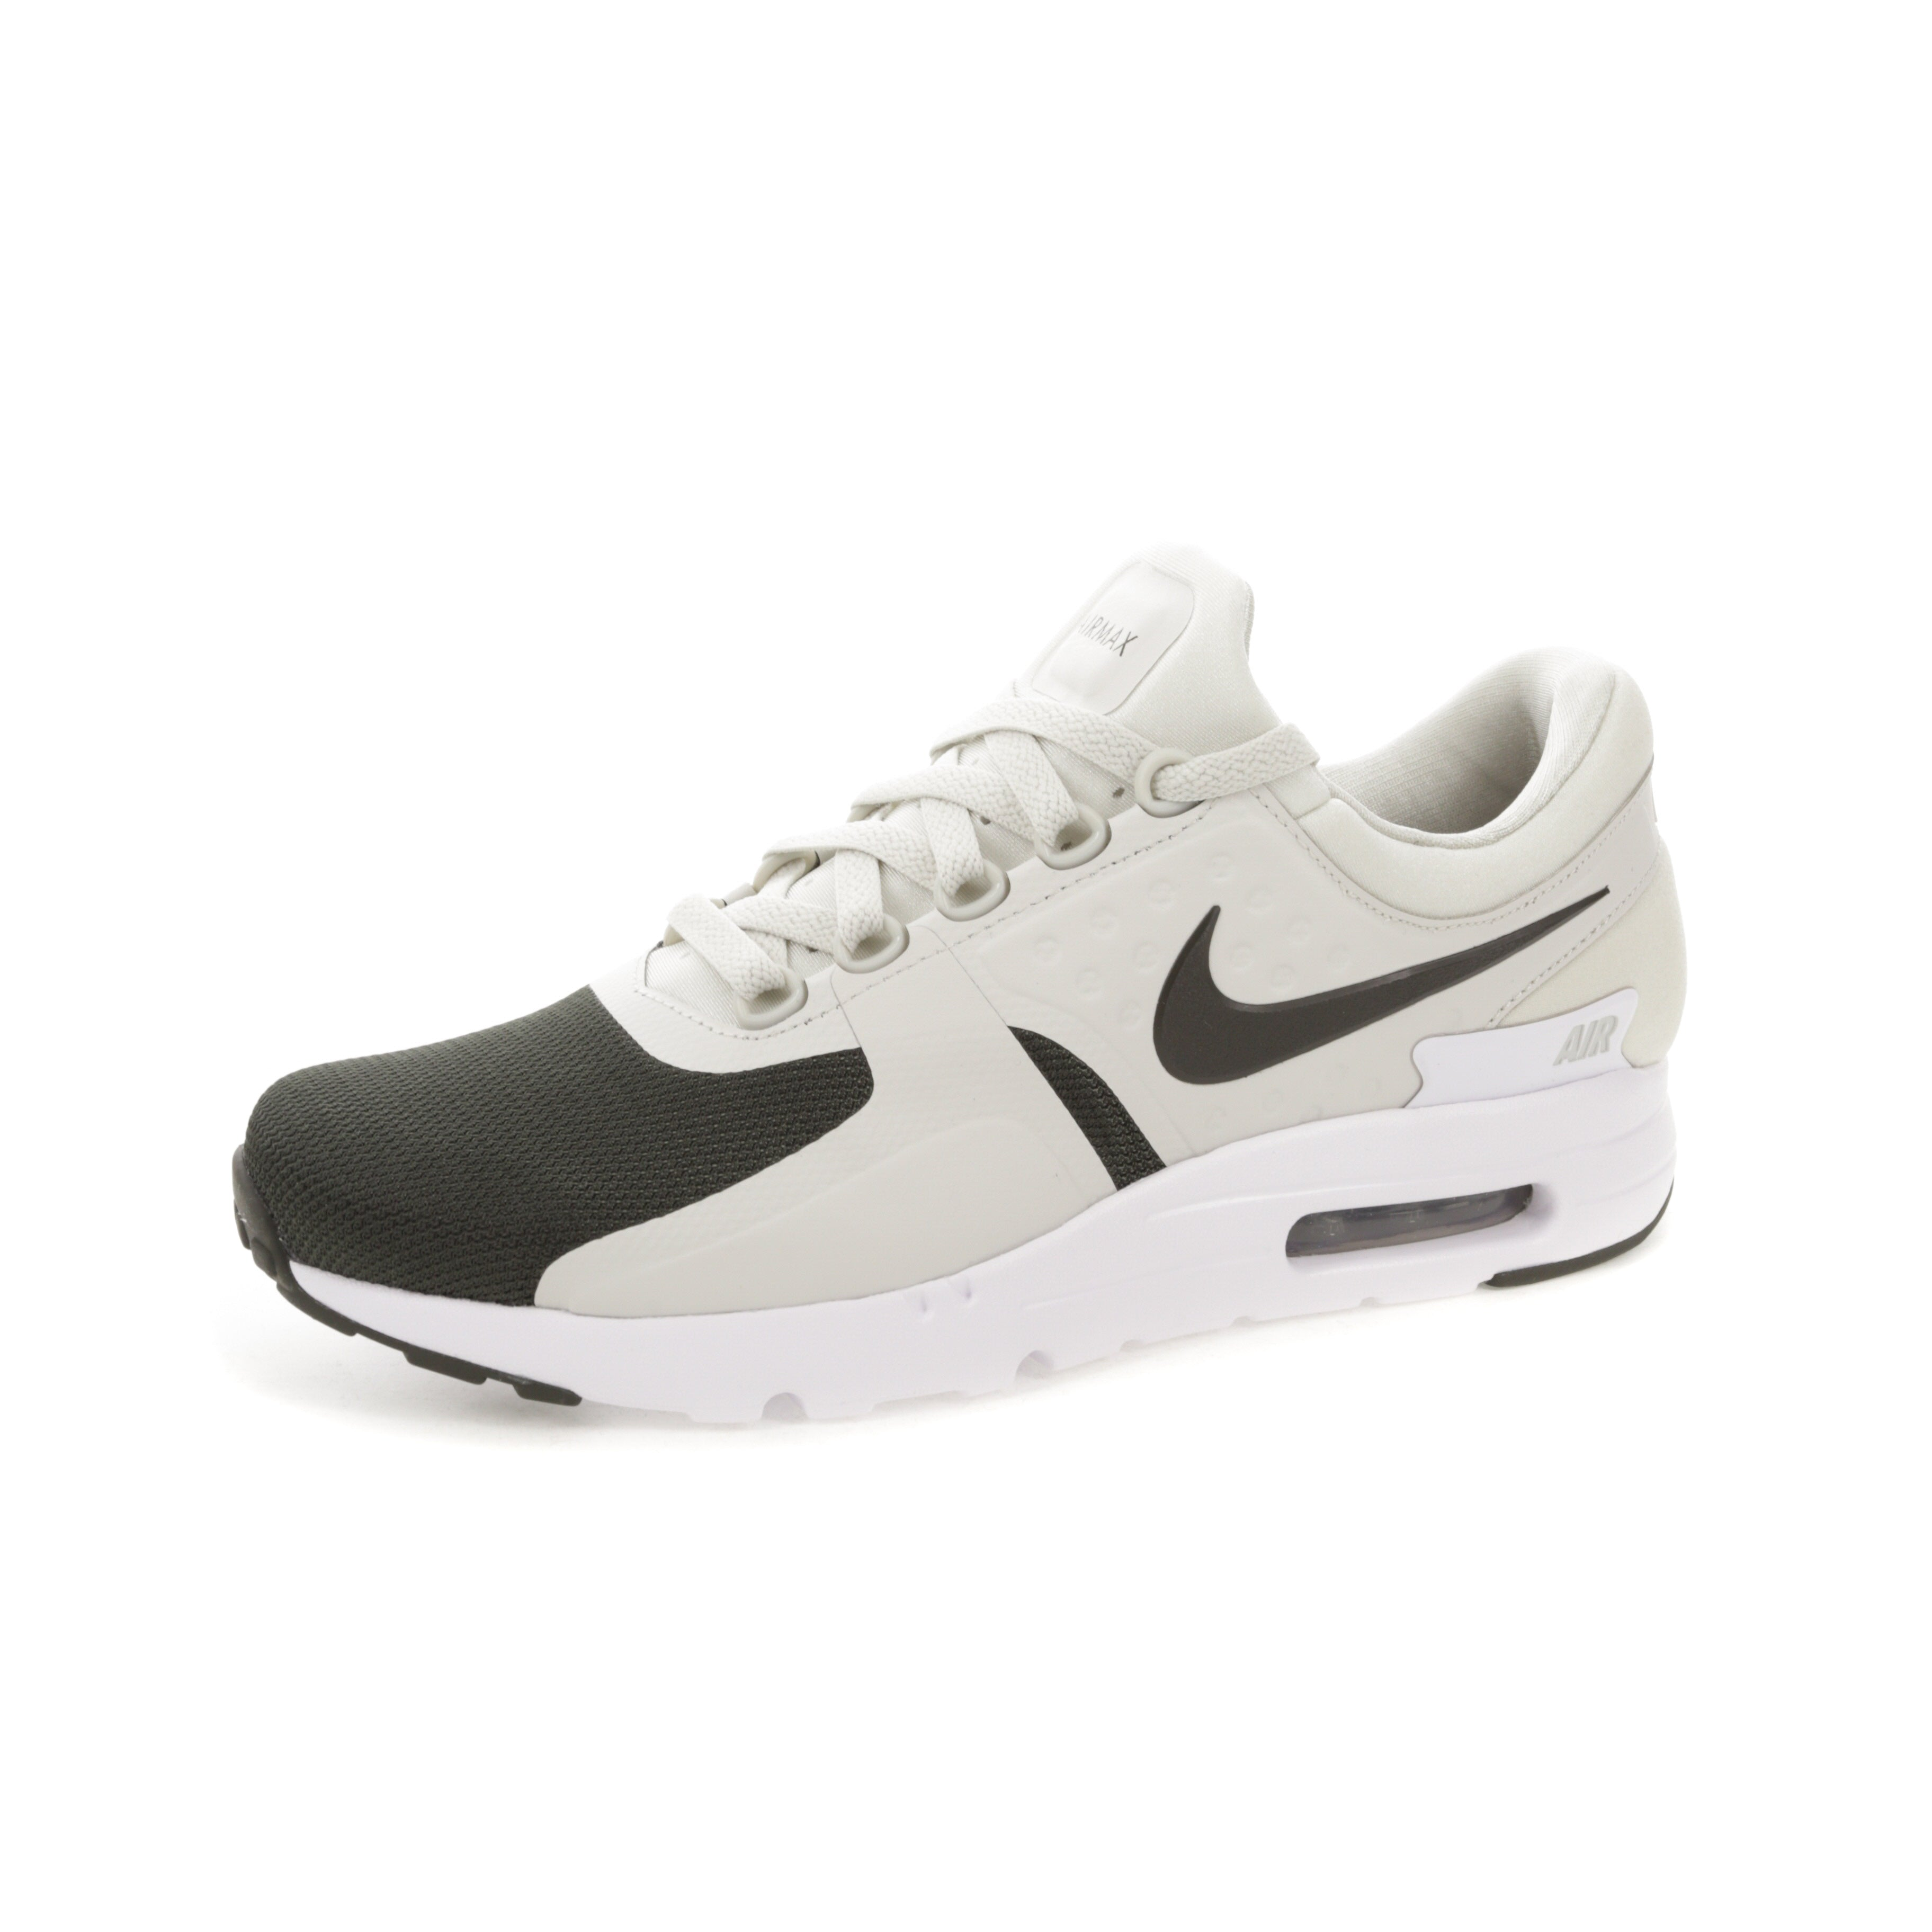 876070 008 Homme Nike Air Max Zero Essential Gris